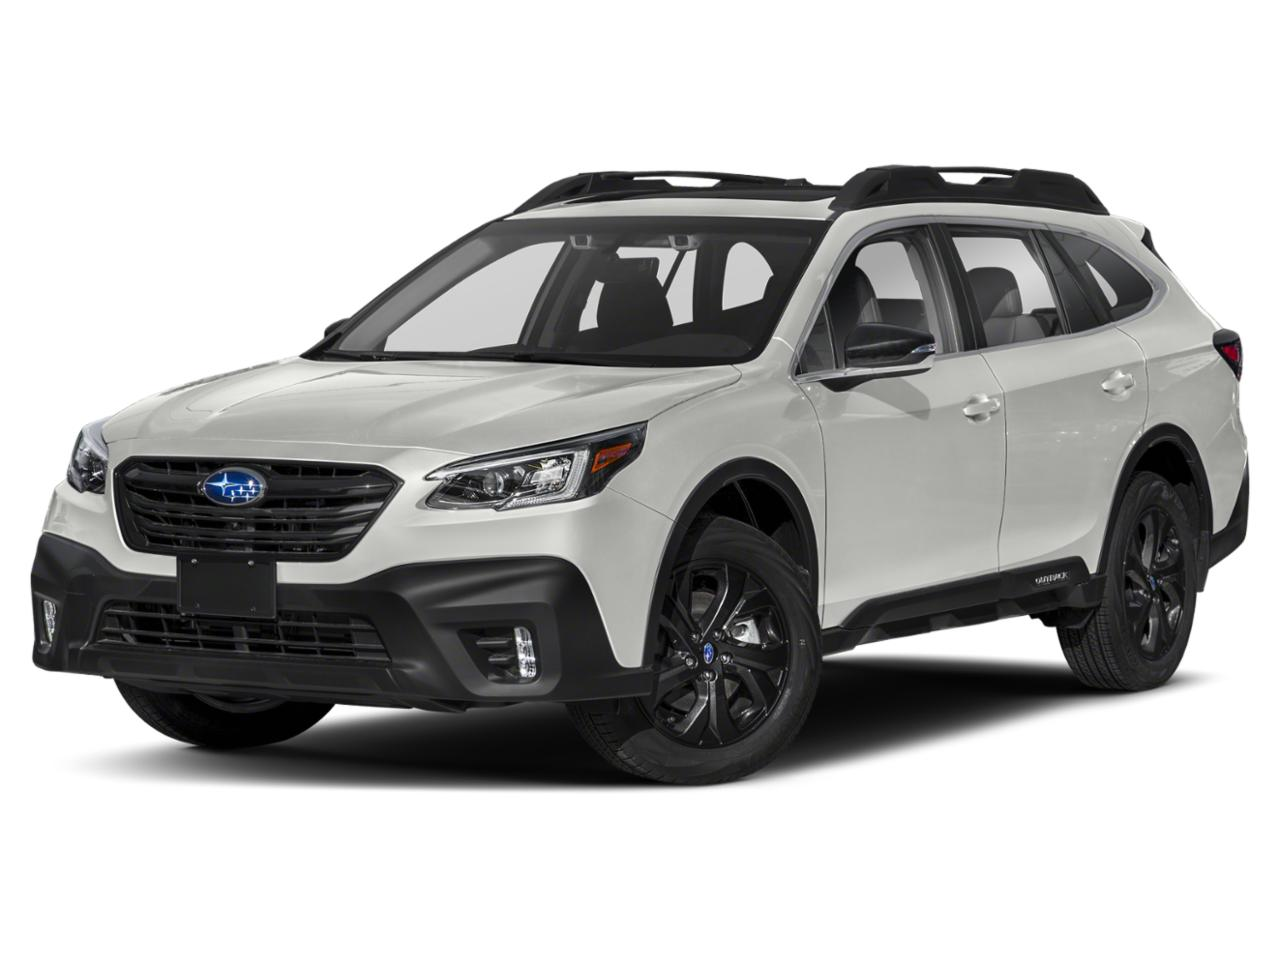 2020 Subaru Outback ONYX EDITION XT SUV Slide